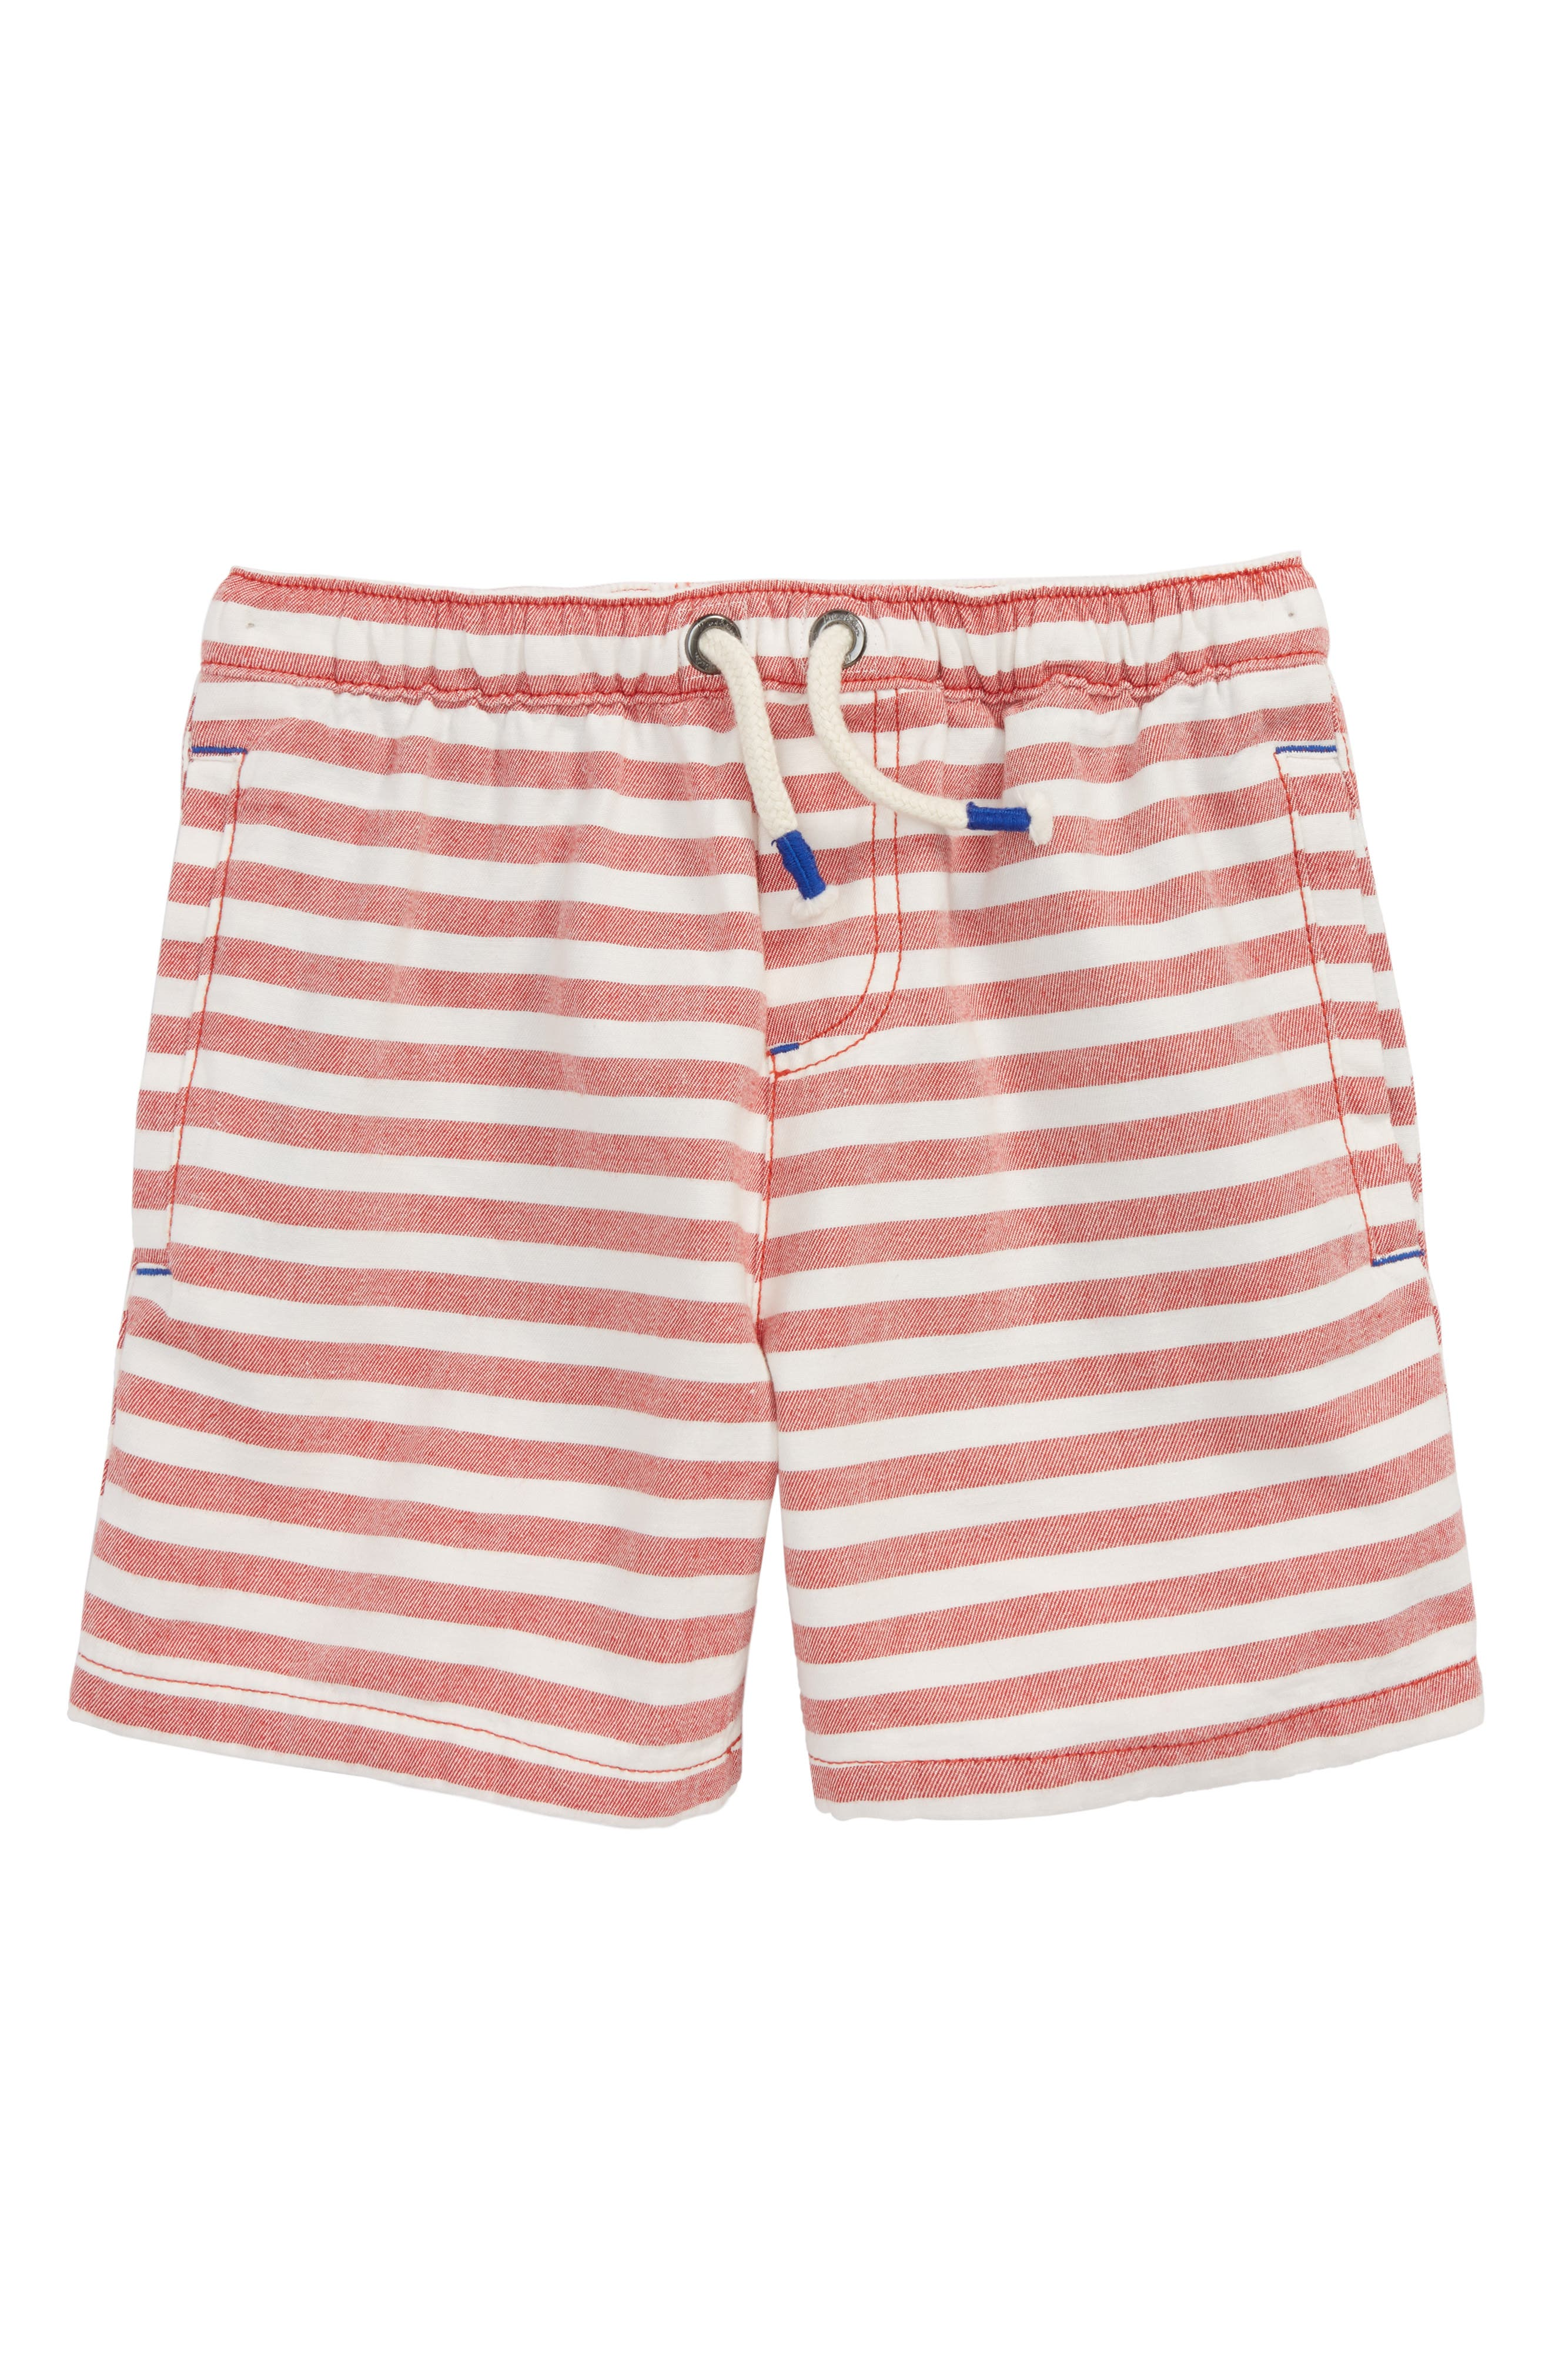 Stripe Drawstring Shorts,                             Main thumbnail 1, color,                             Salsa Red/ Ecru